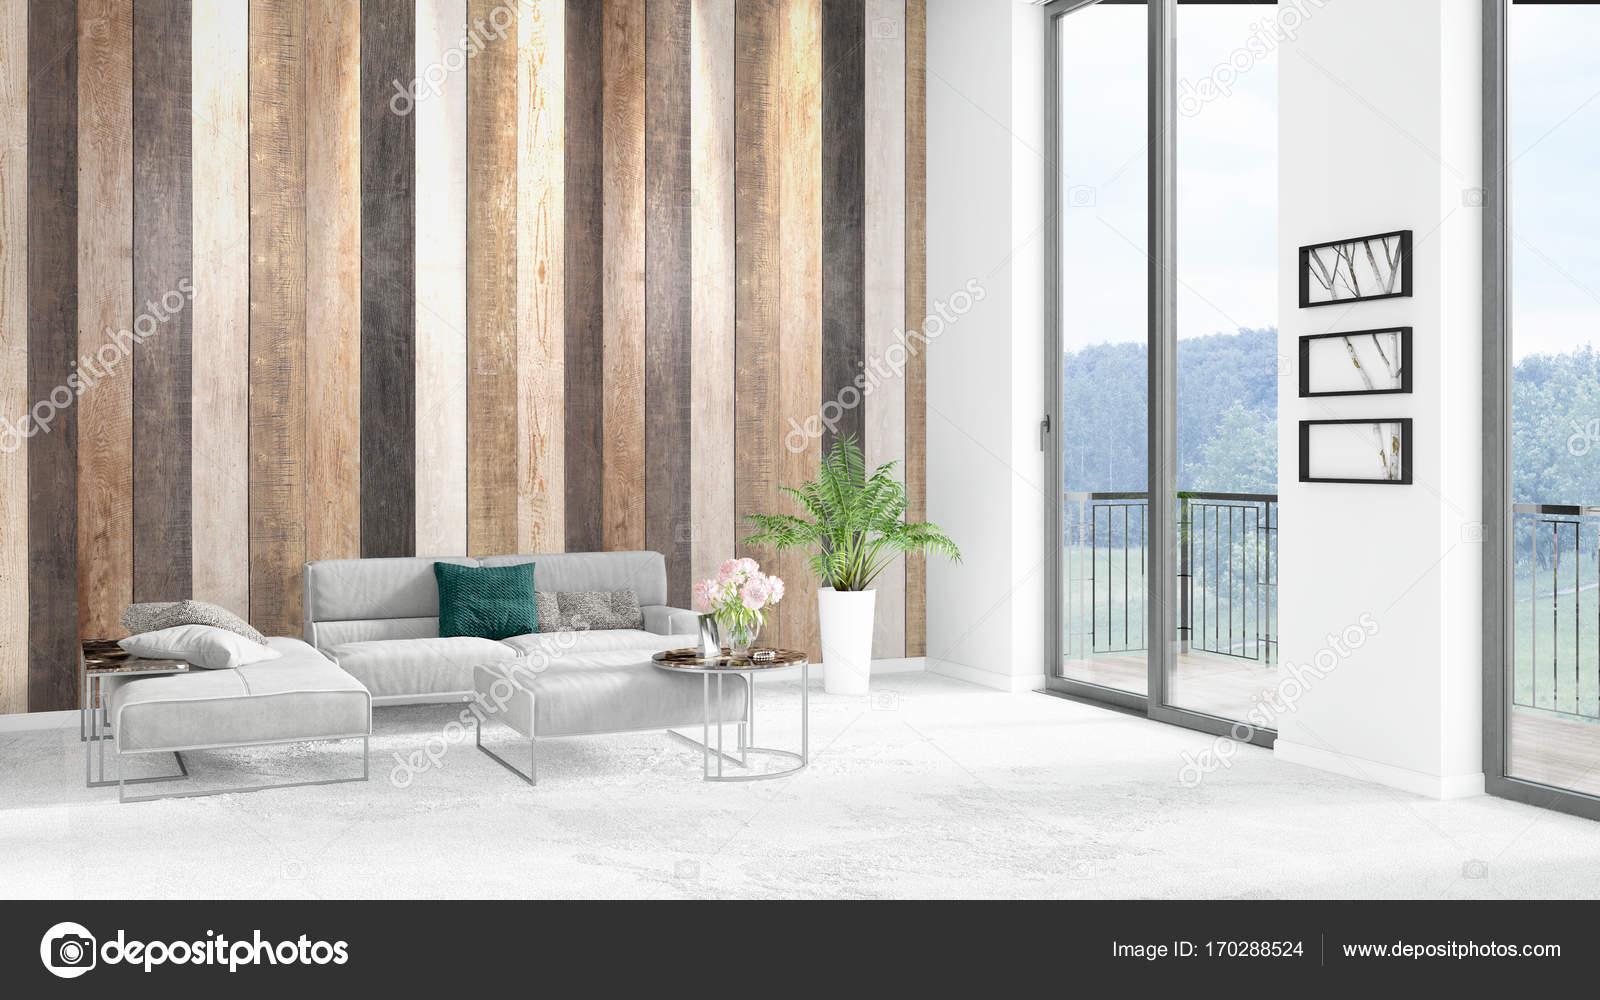 Gloednieuwe witte loft slaapkamer minimalistische stijl interieur